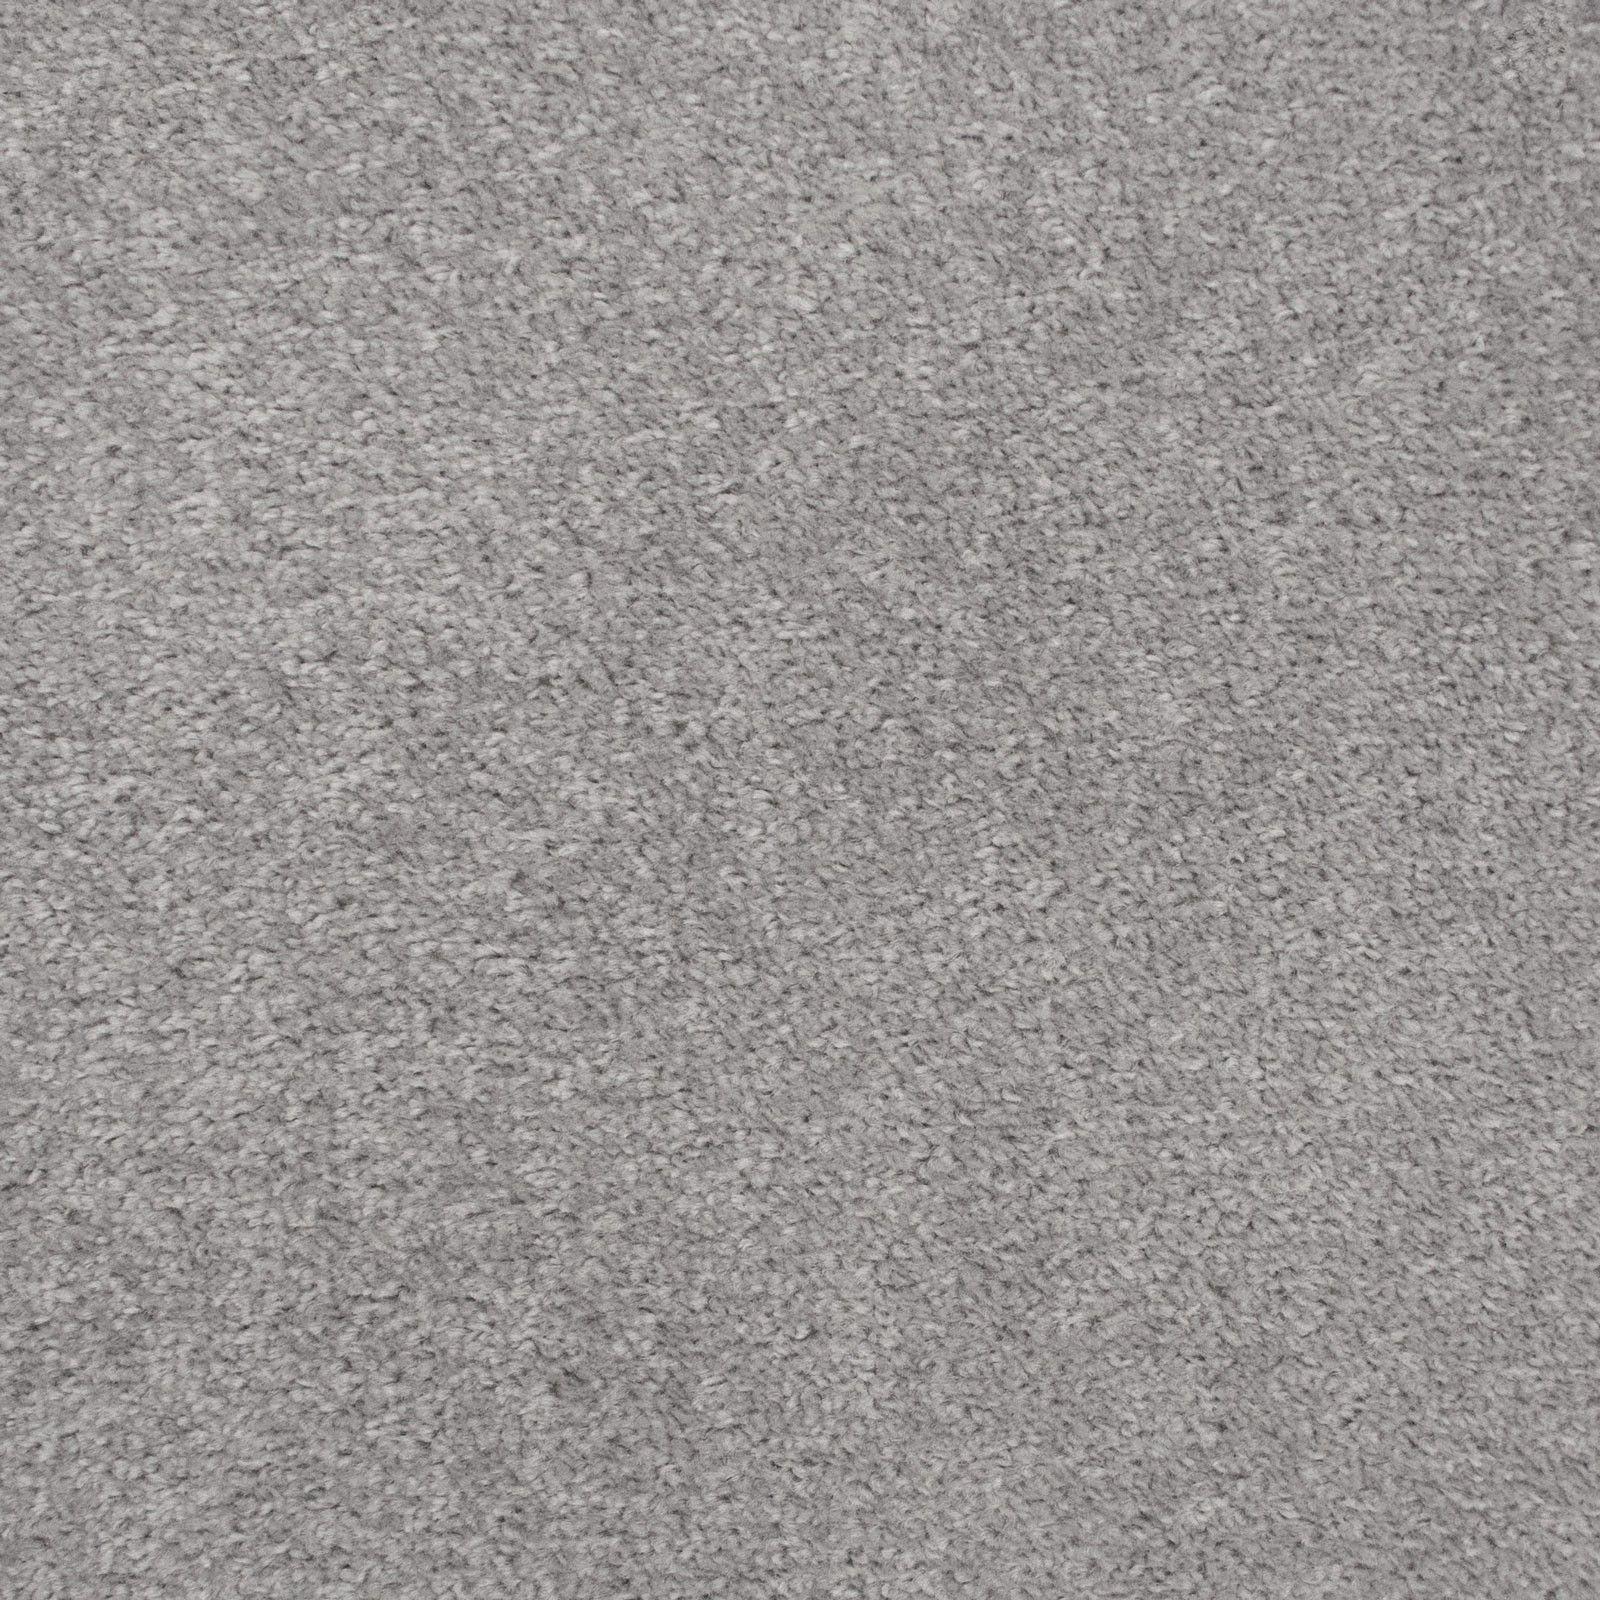 Best Grey Belton Feltback Twist Carpet With Images Carpets 400 x 300